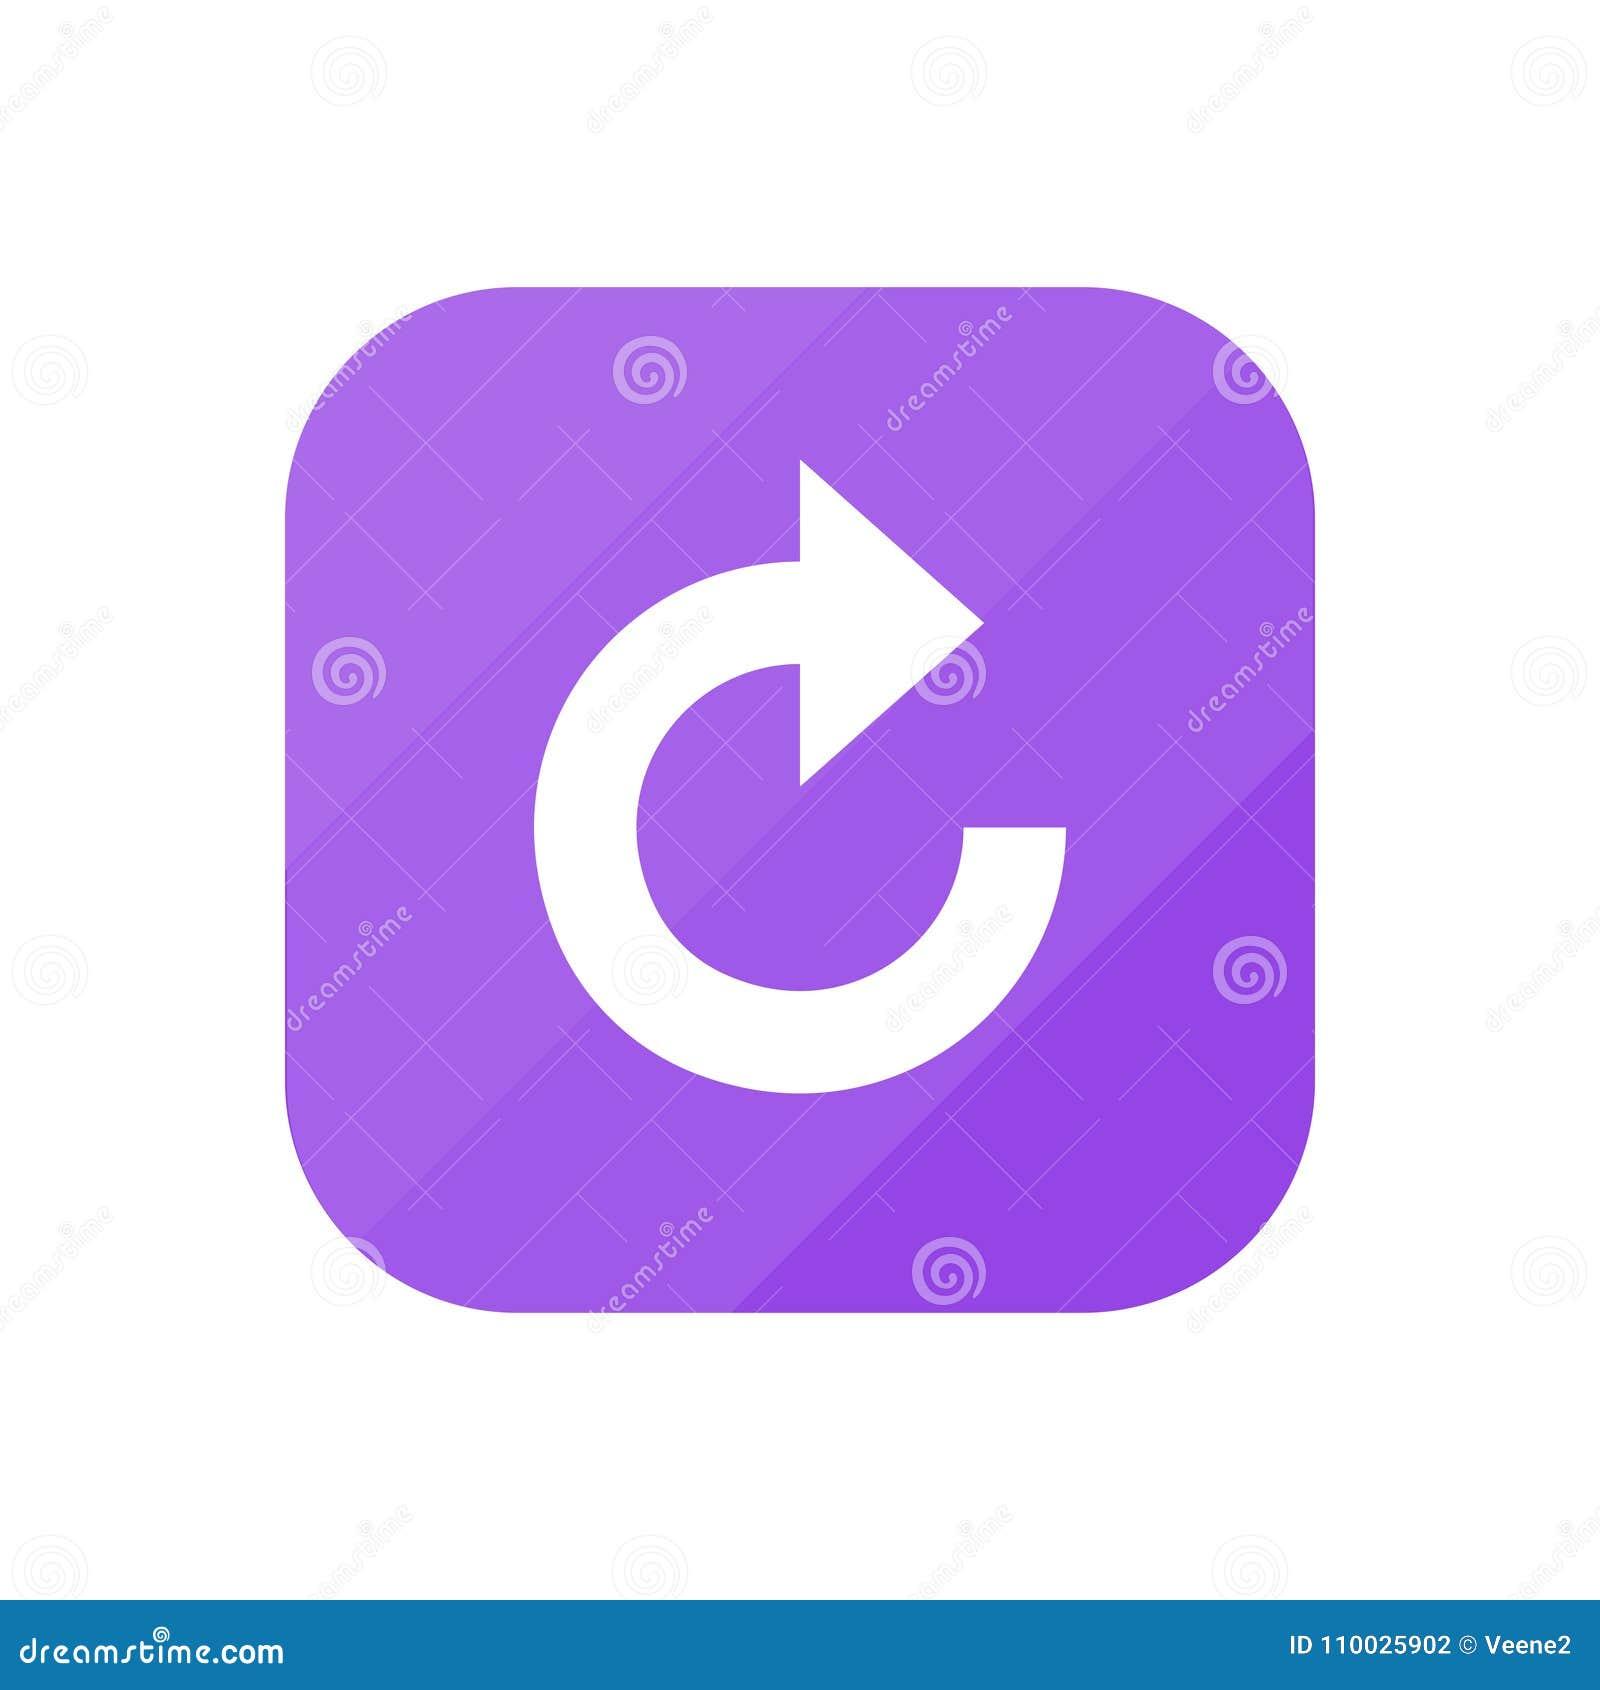 Doe - App Pictogram over